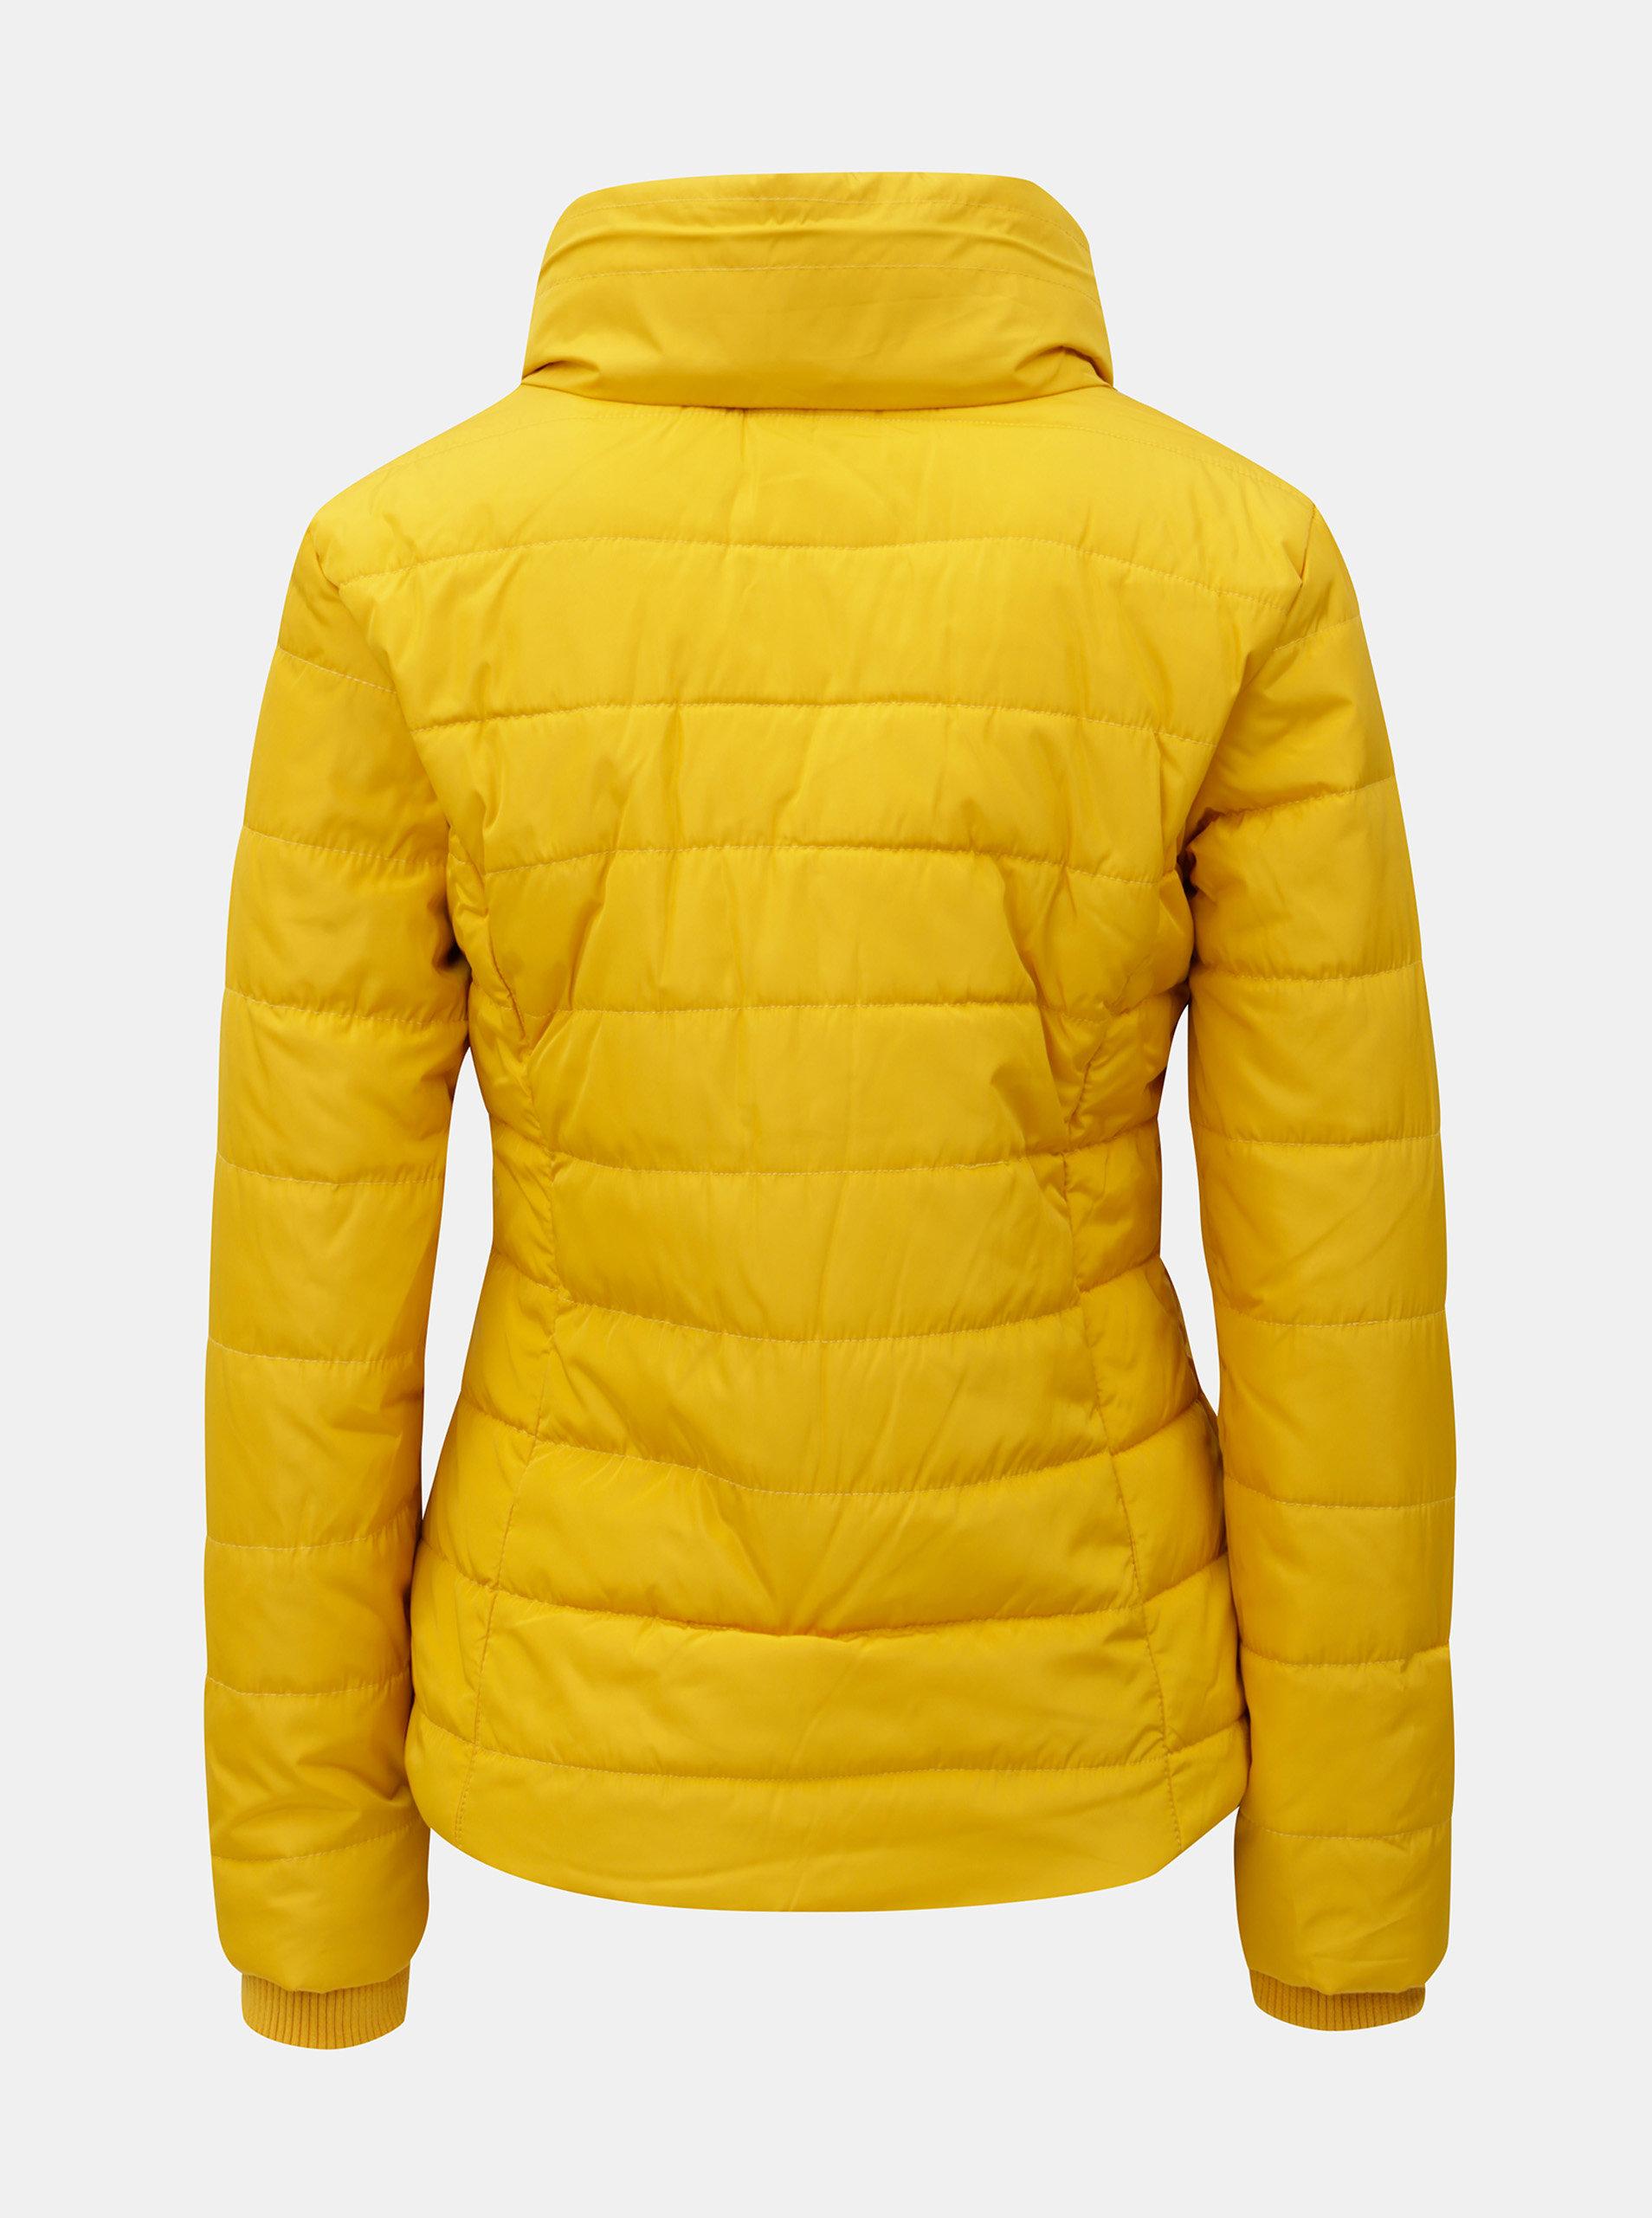 Žlutá zimní prošívaná bunda s vysokým límcem Dorothy Perkins ... c5eeec3f96